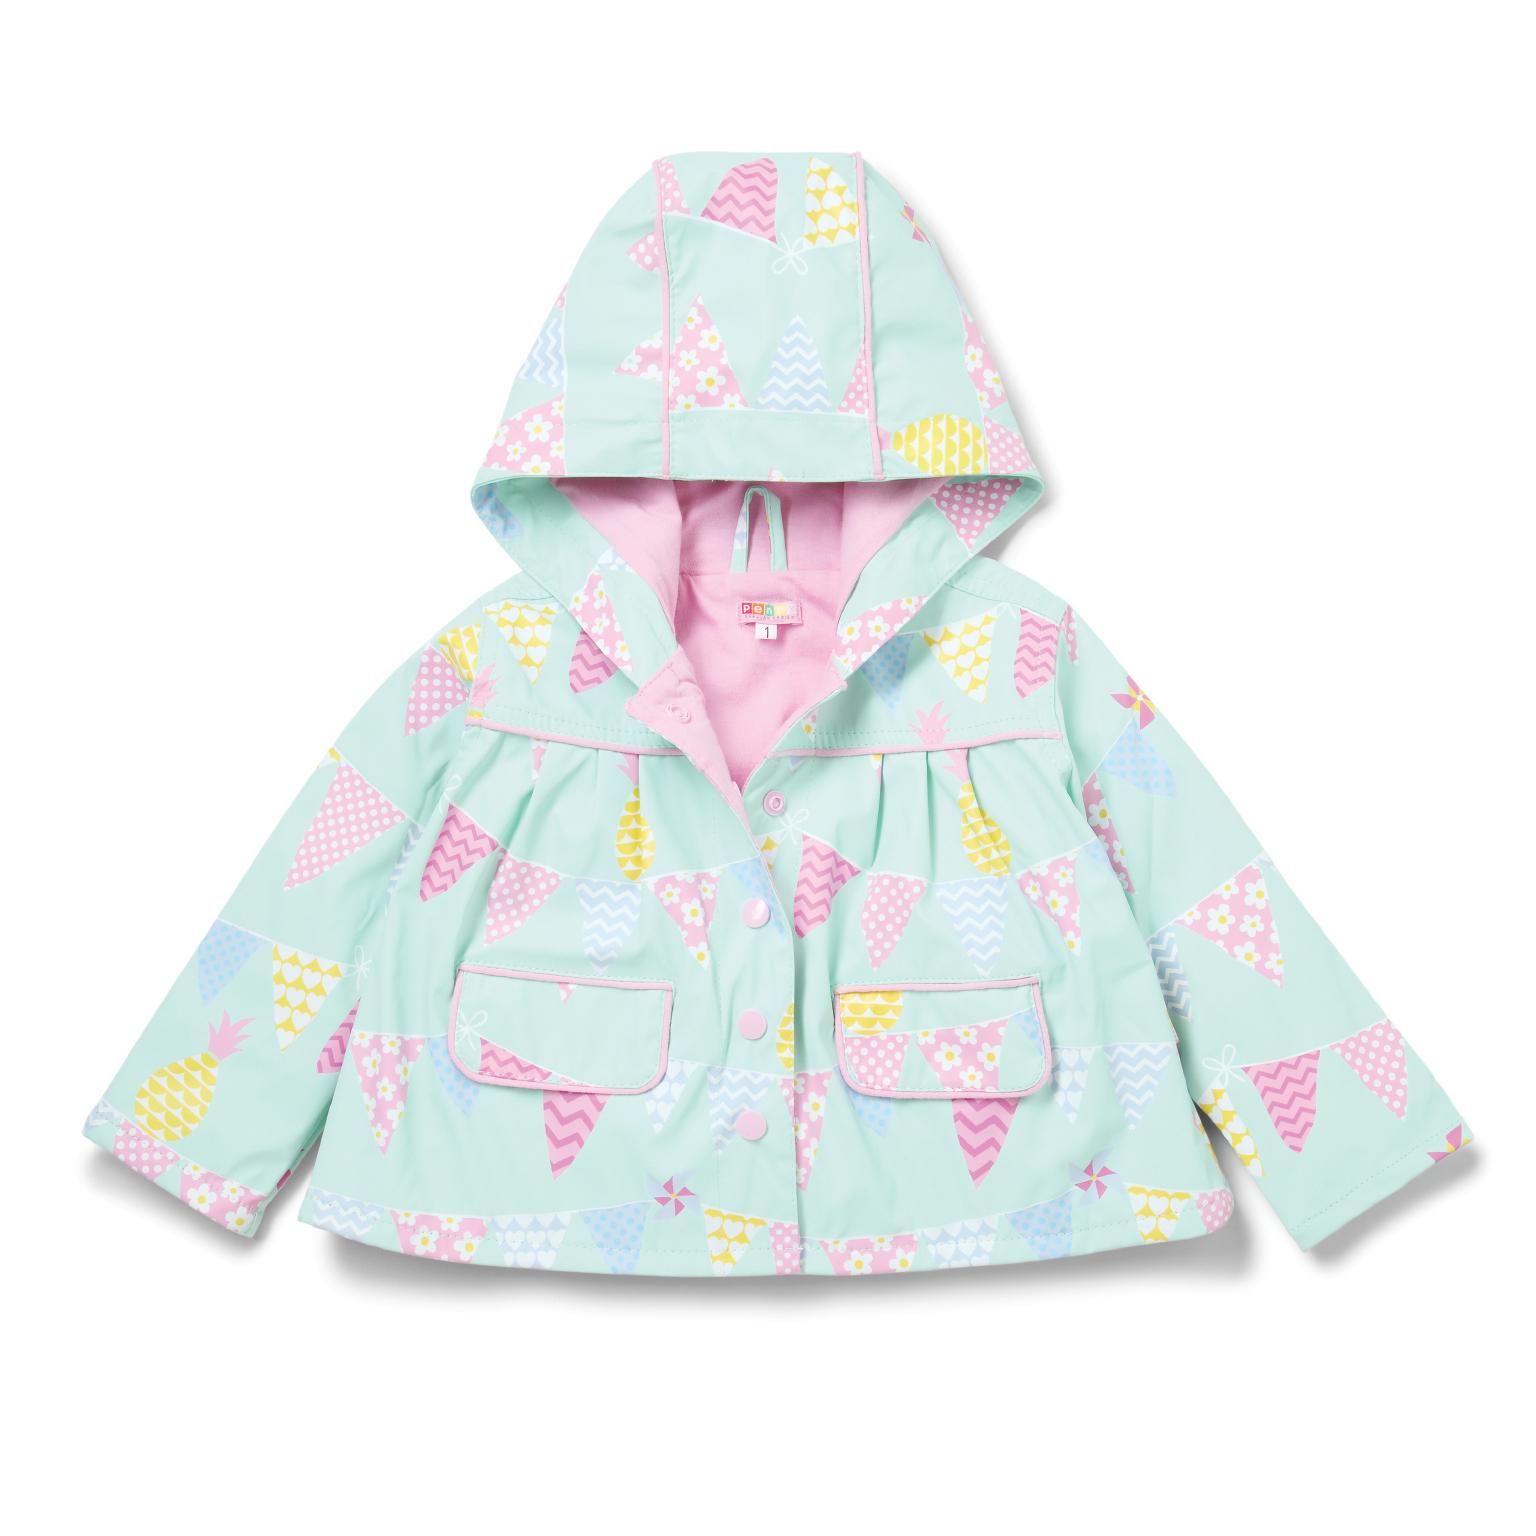 Raincoat Pineapple Bunting - Size 5-6 image